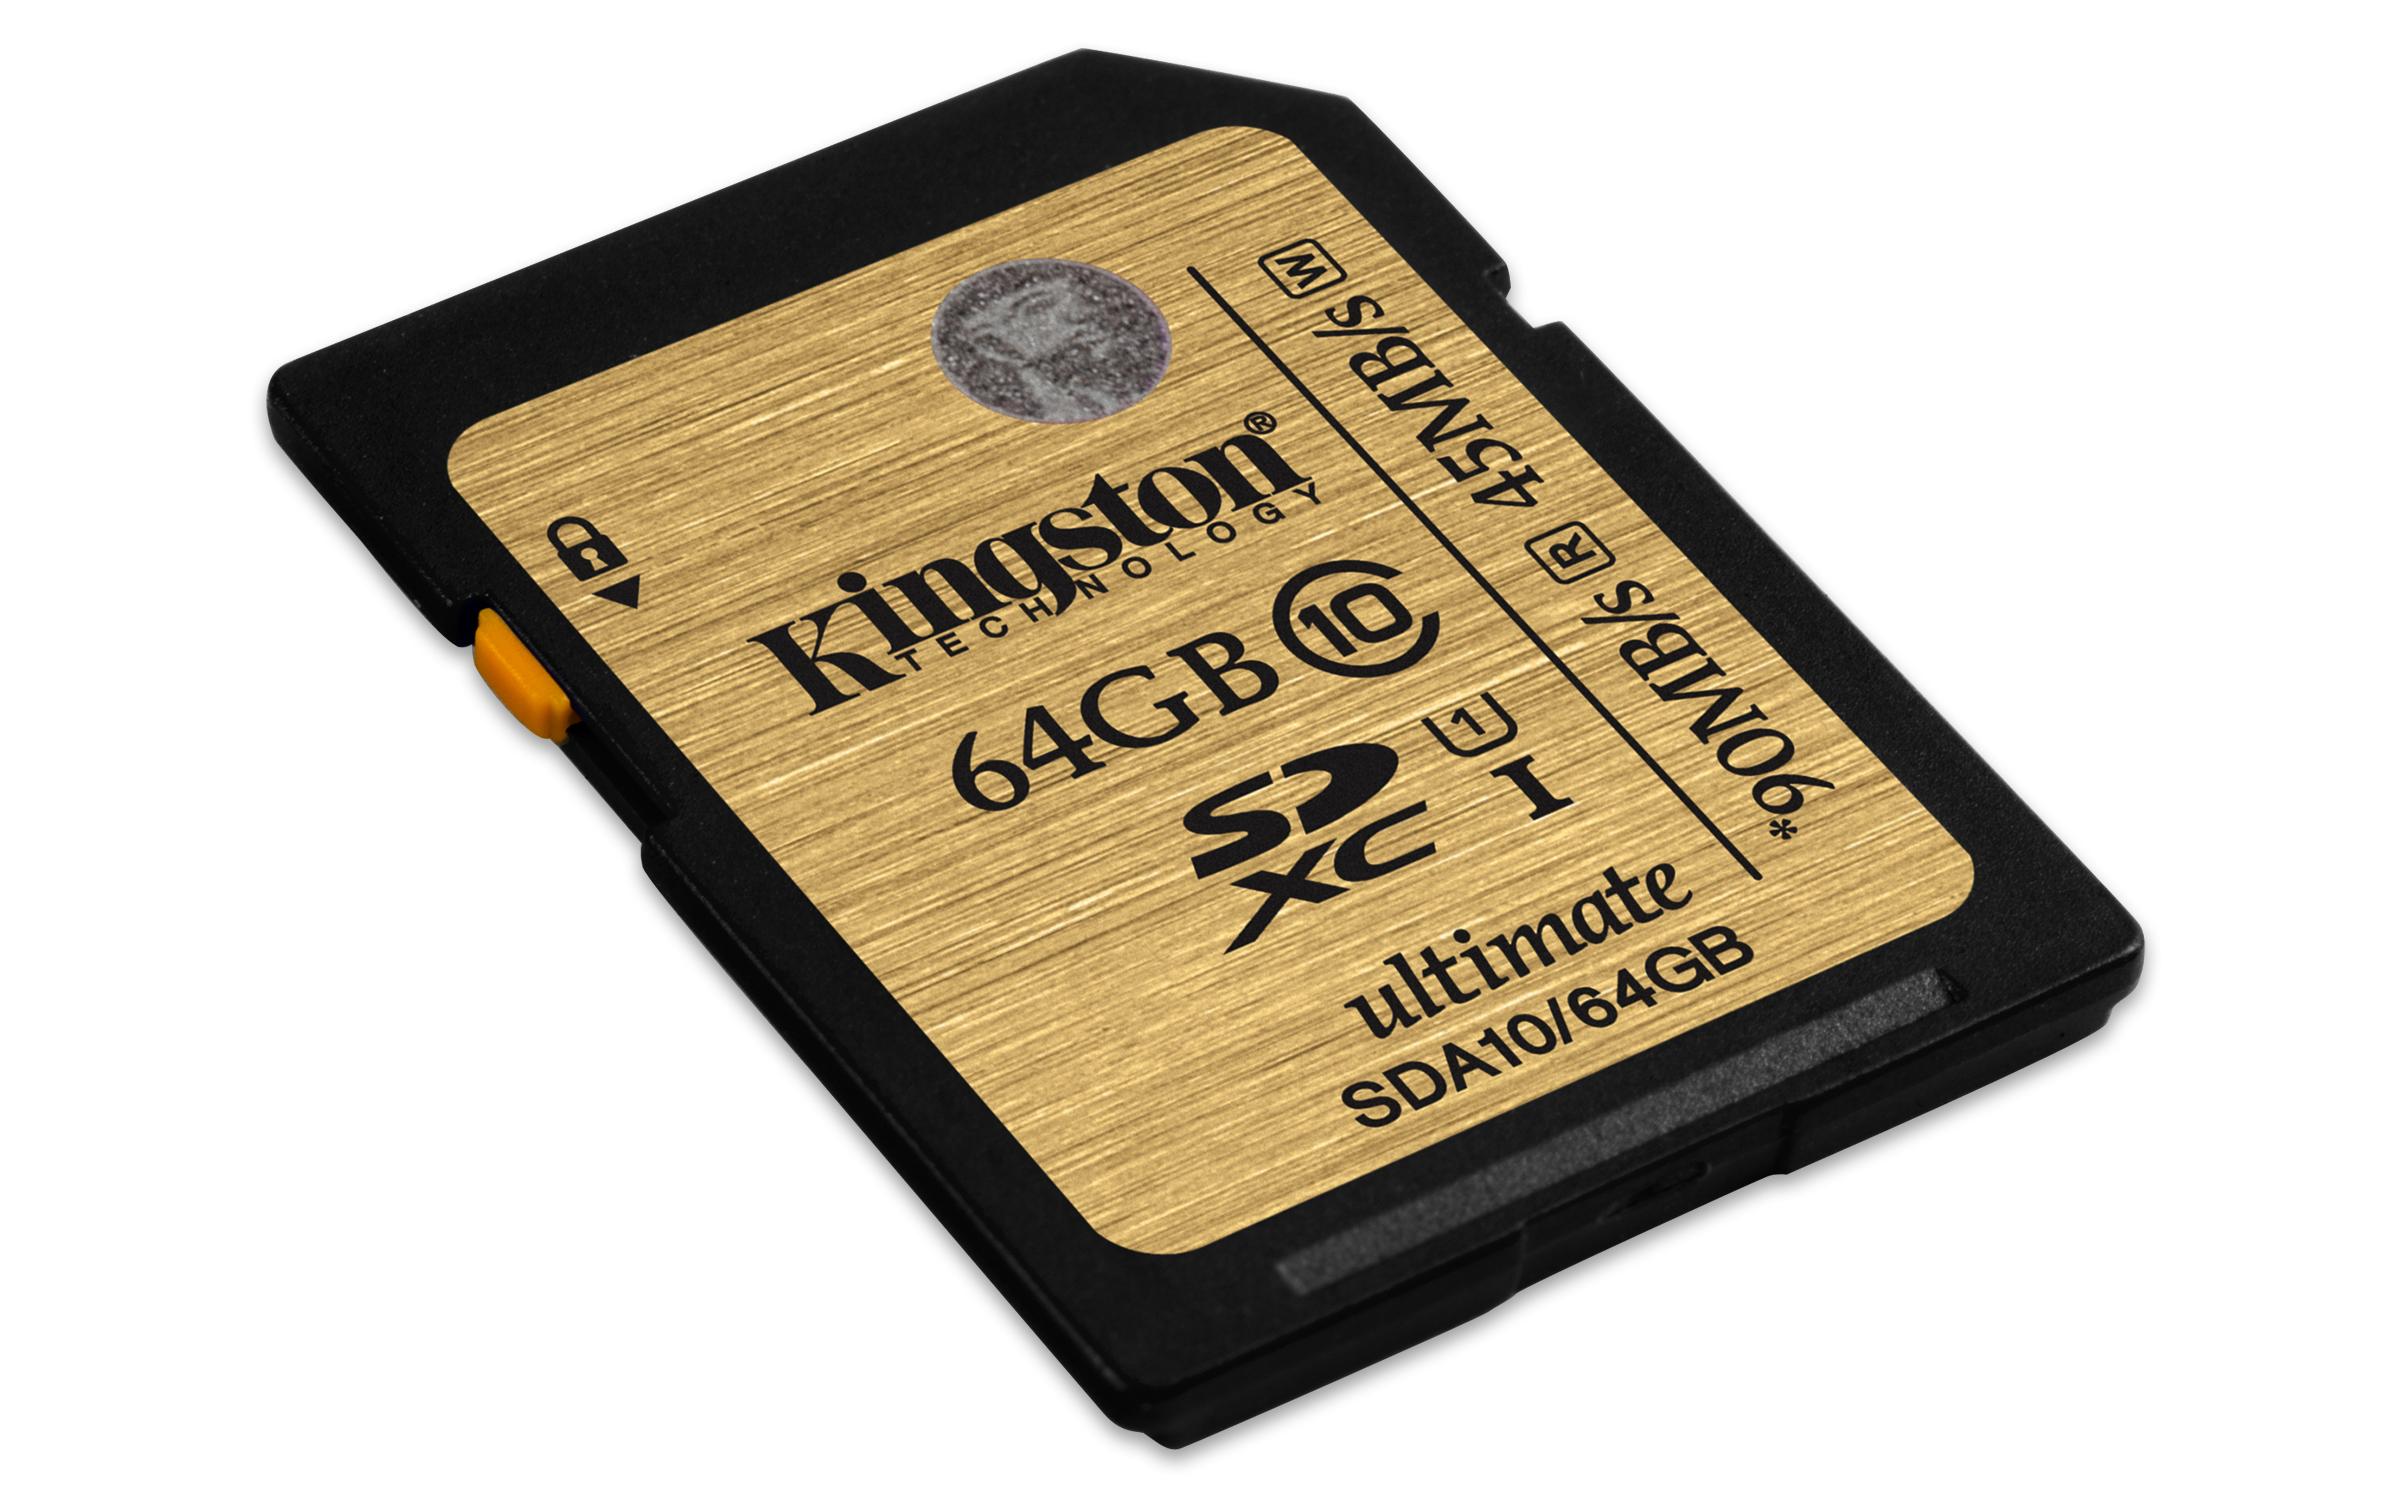 64GB SDXC Ultimate UHS-I Kingston class 10